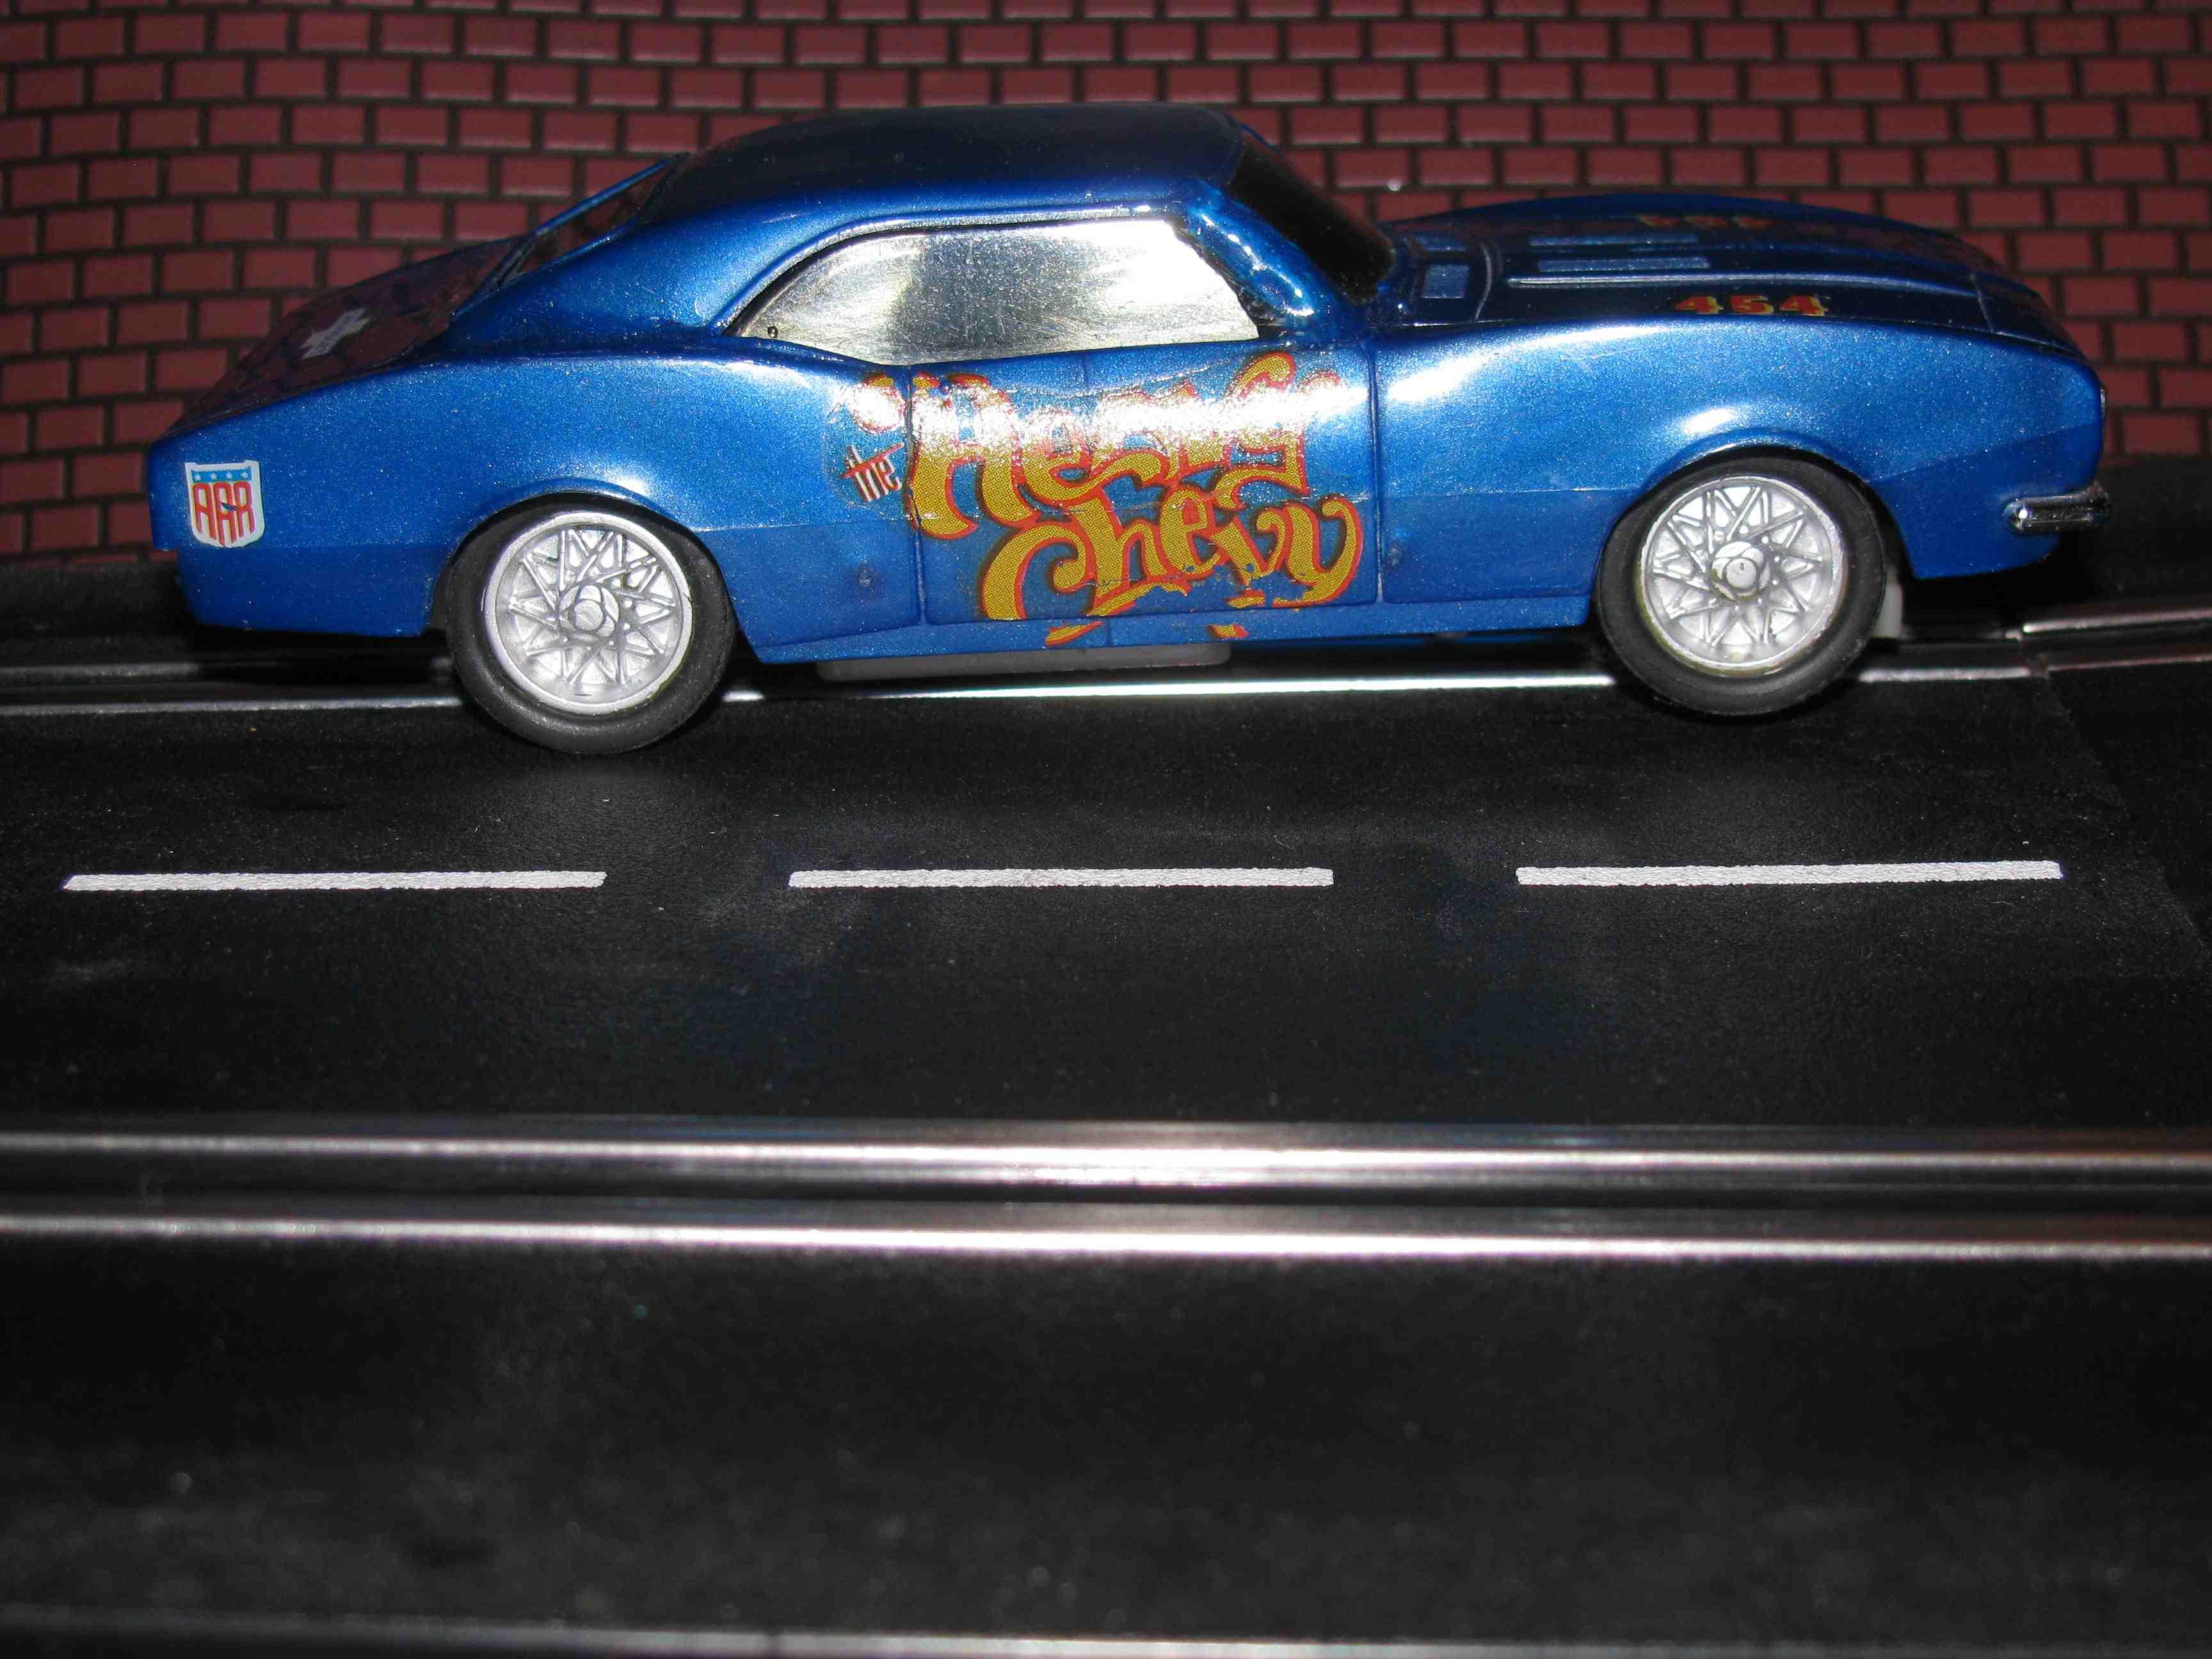 "* SOLD * Eldon 1966 Camaro Slot Car – Blue ""Heavy Chevy"" Slot Car - 1/32 Scale"